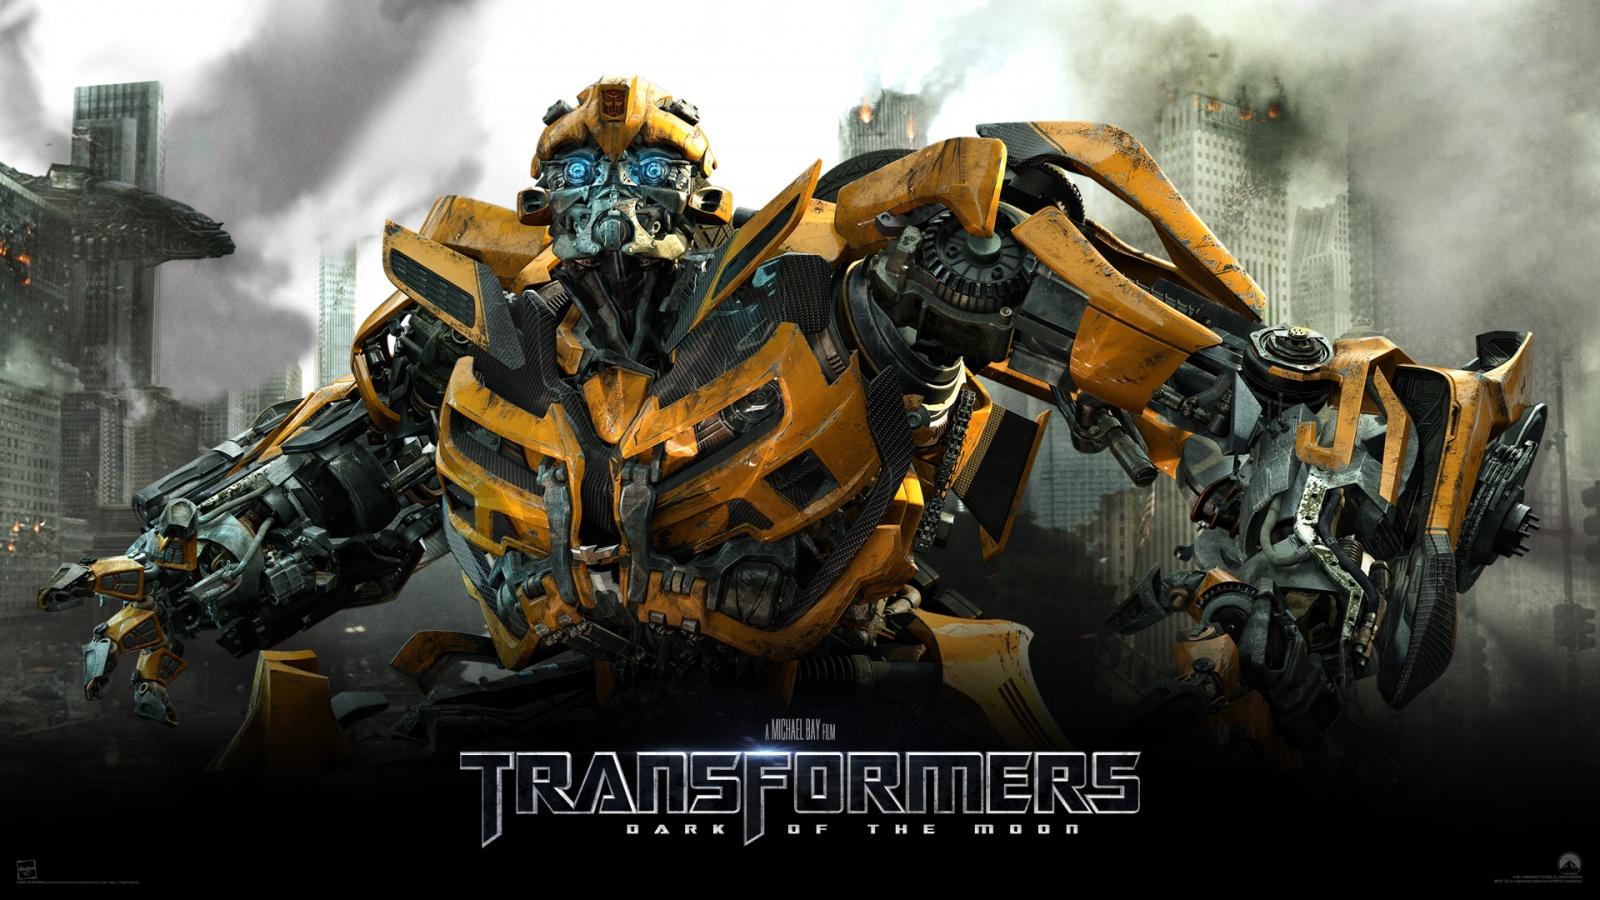 Bumblebee Transformers Dark of The Moon Wallpapers HD Wallpapers 1600x900